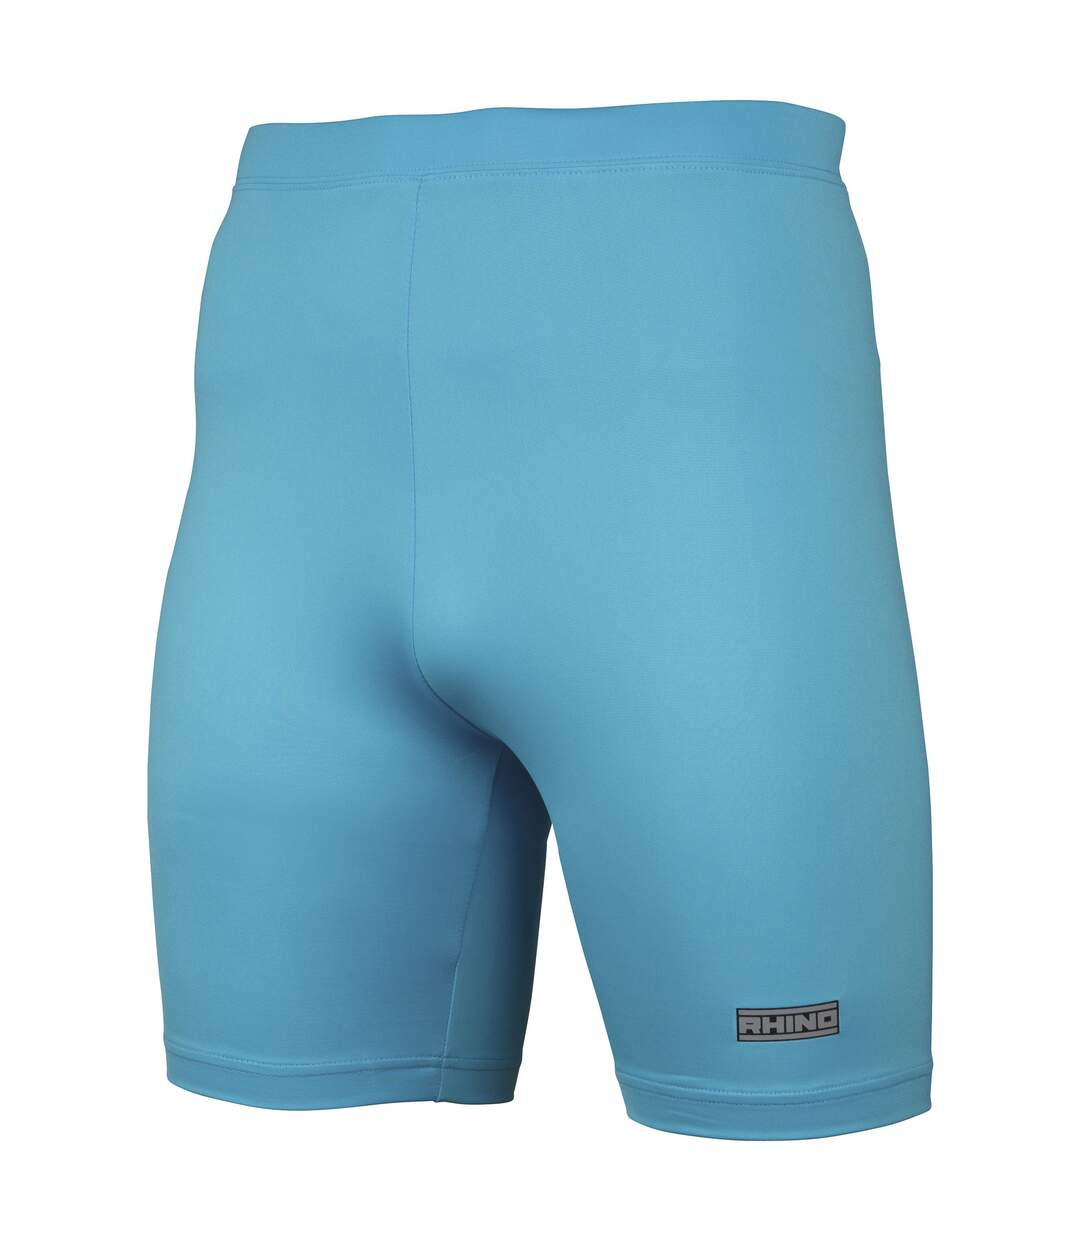 Rhino Mens Sports Base Layer Shorts (Light Blue) - UTRW1278